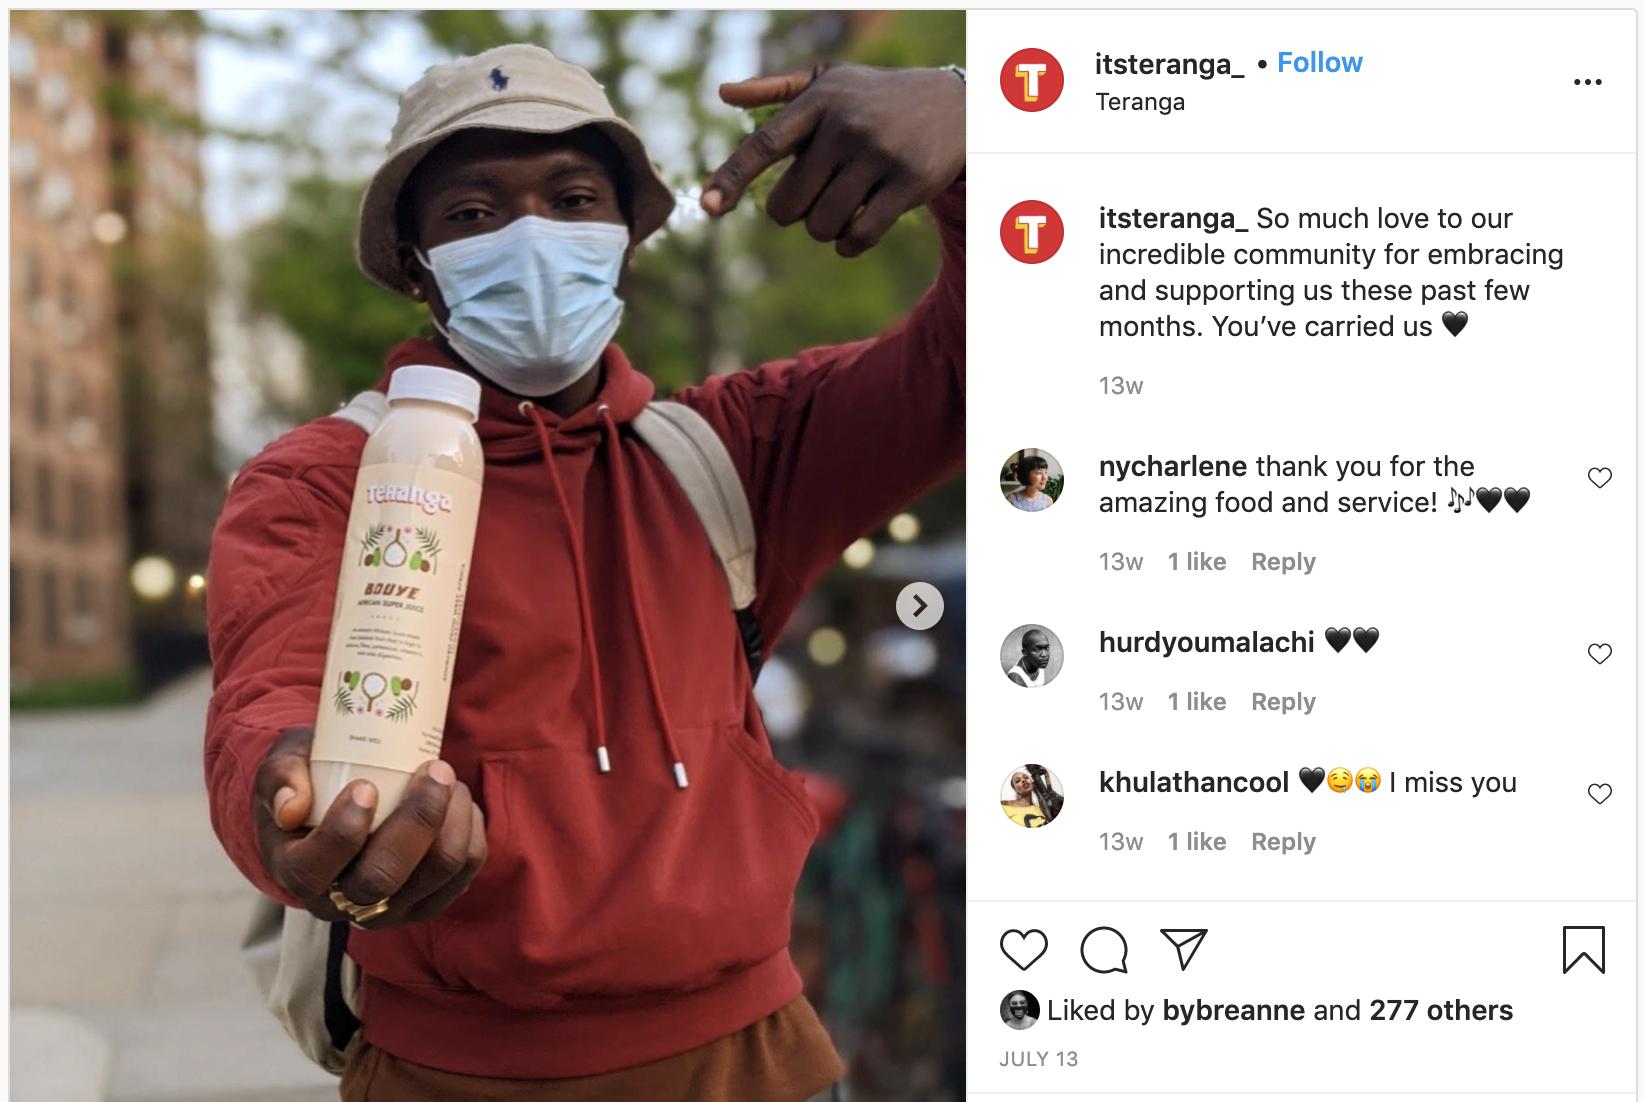 Teranga Instagram post